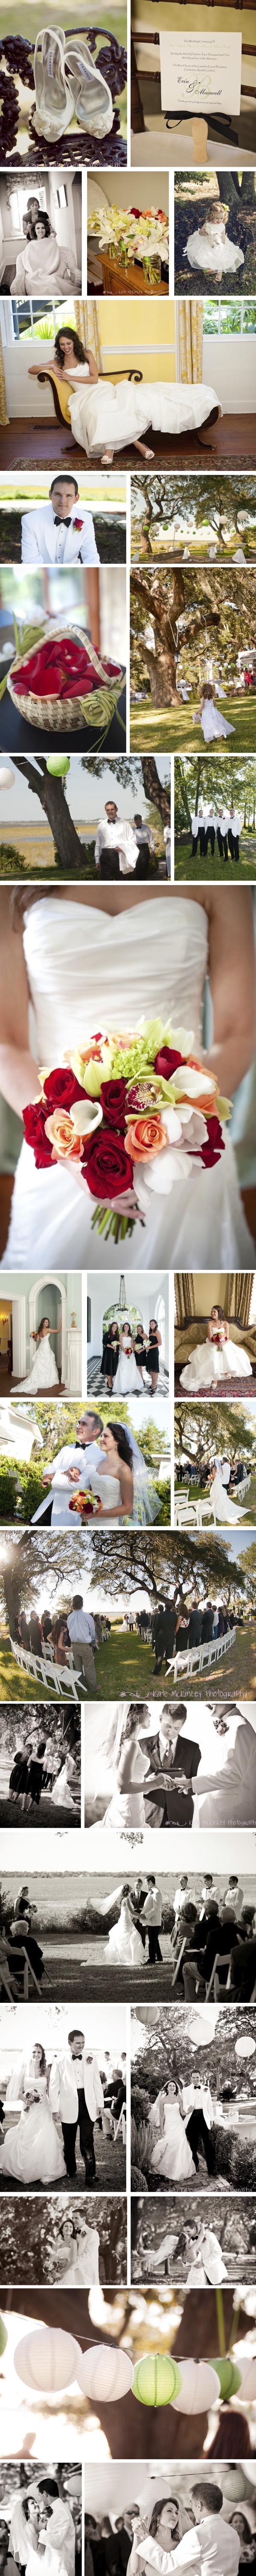 Charletston Wedding Blog